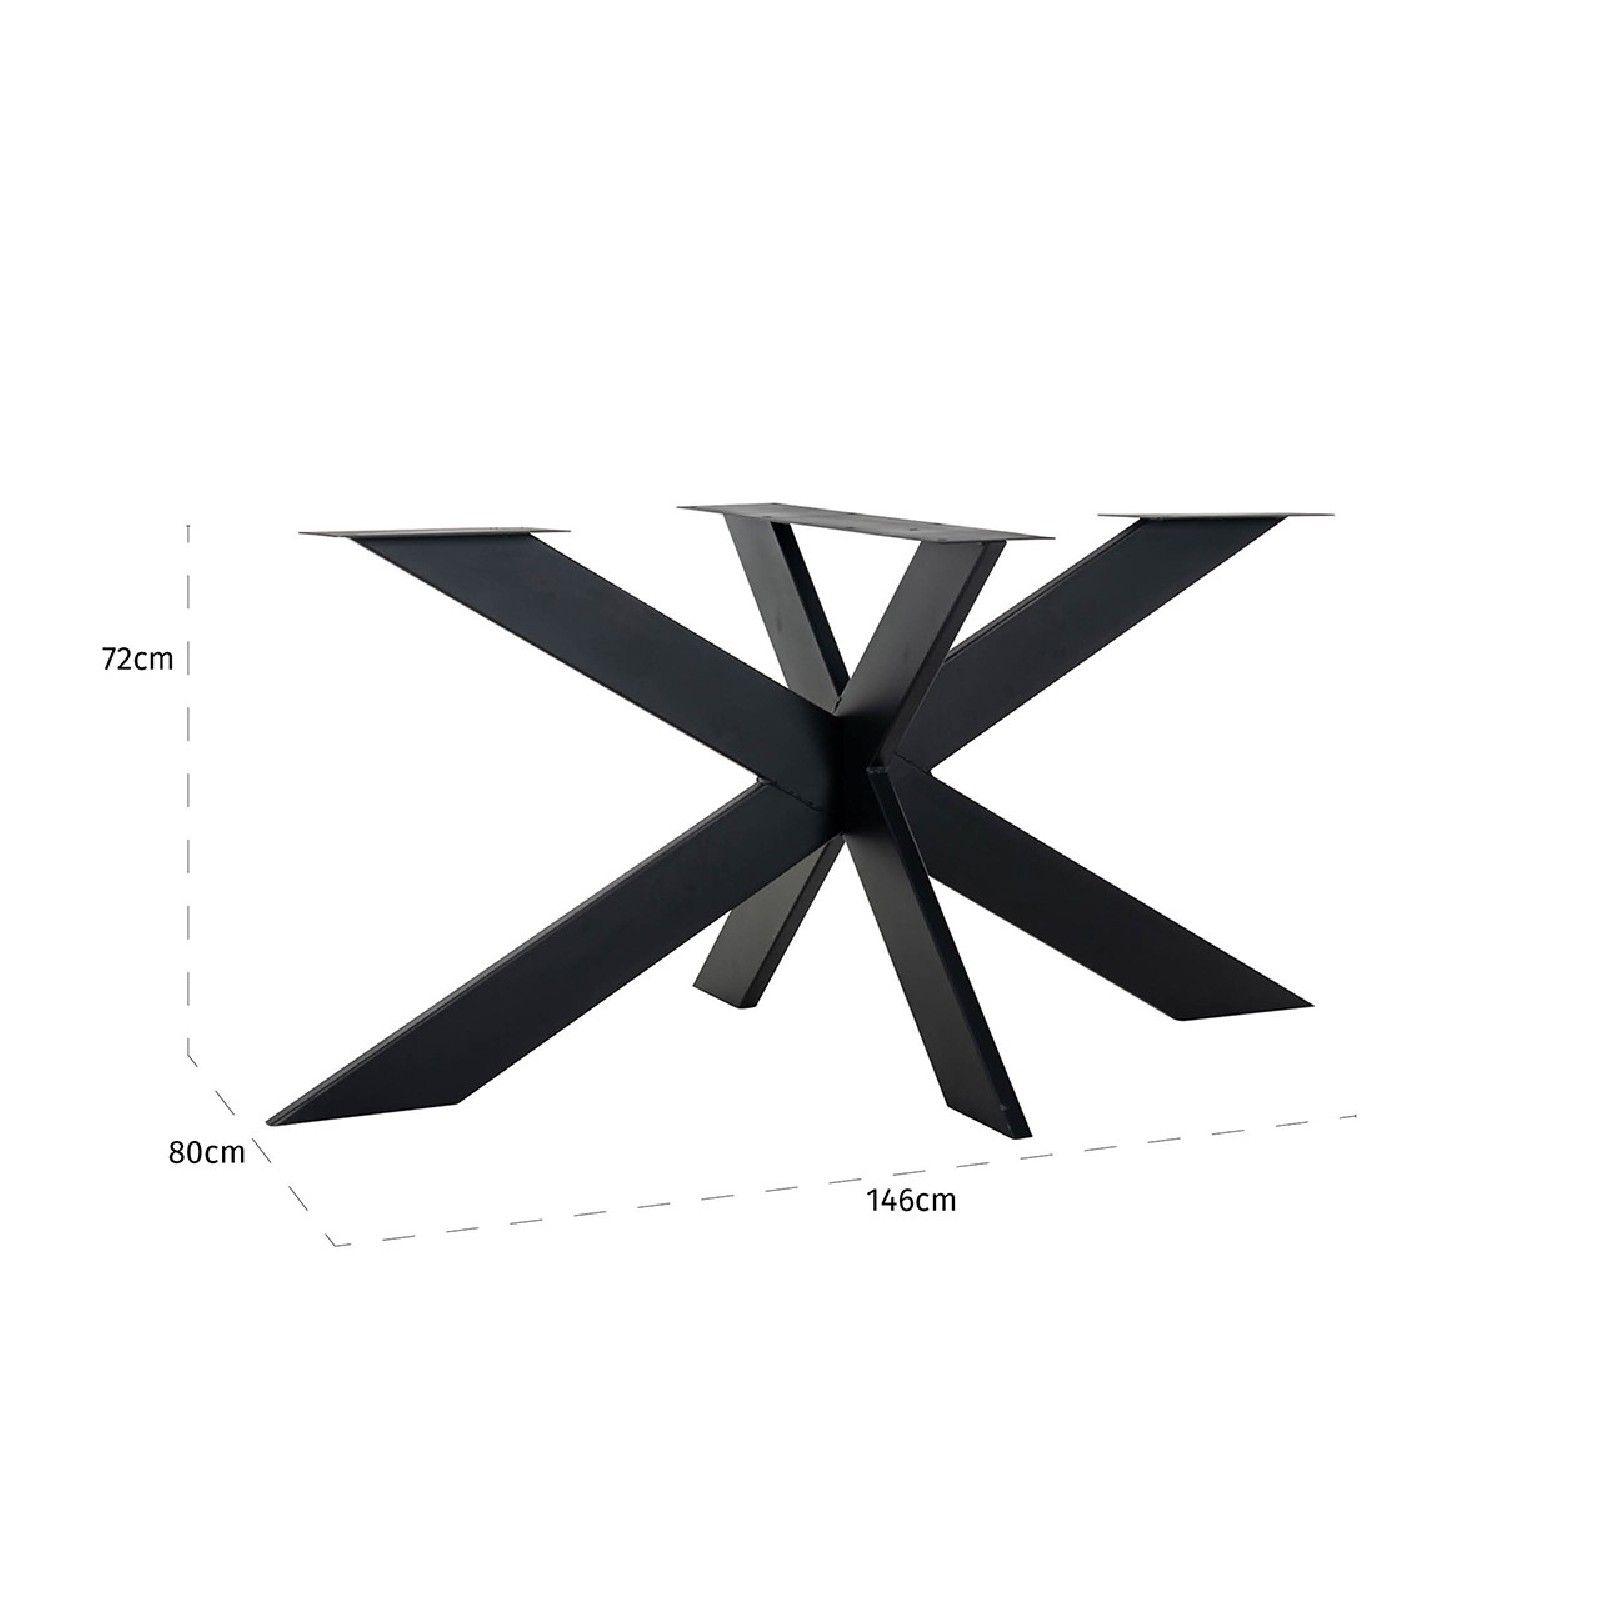 Pied Industrial Oakura Spider Meuble Déco Tendance - 240